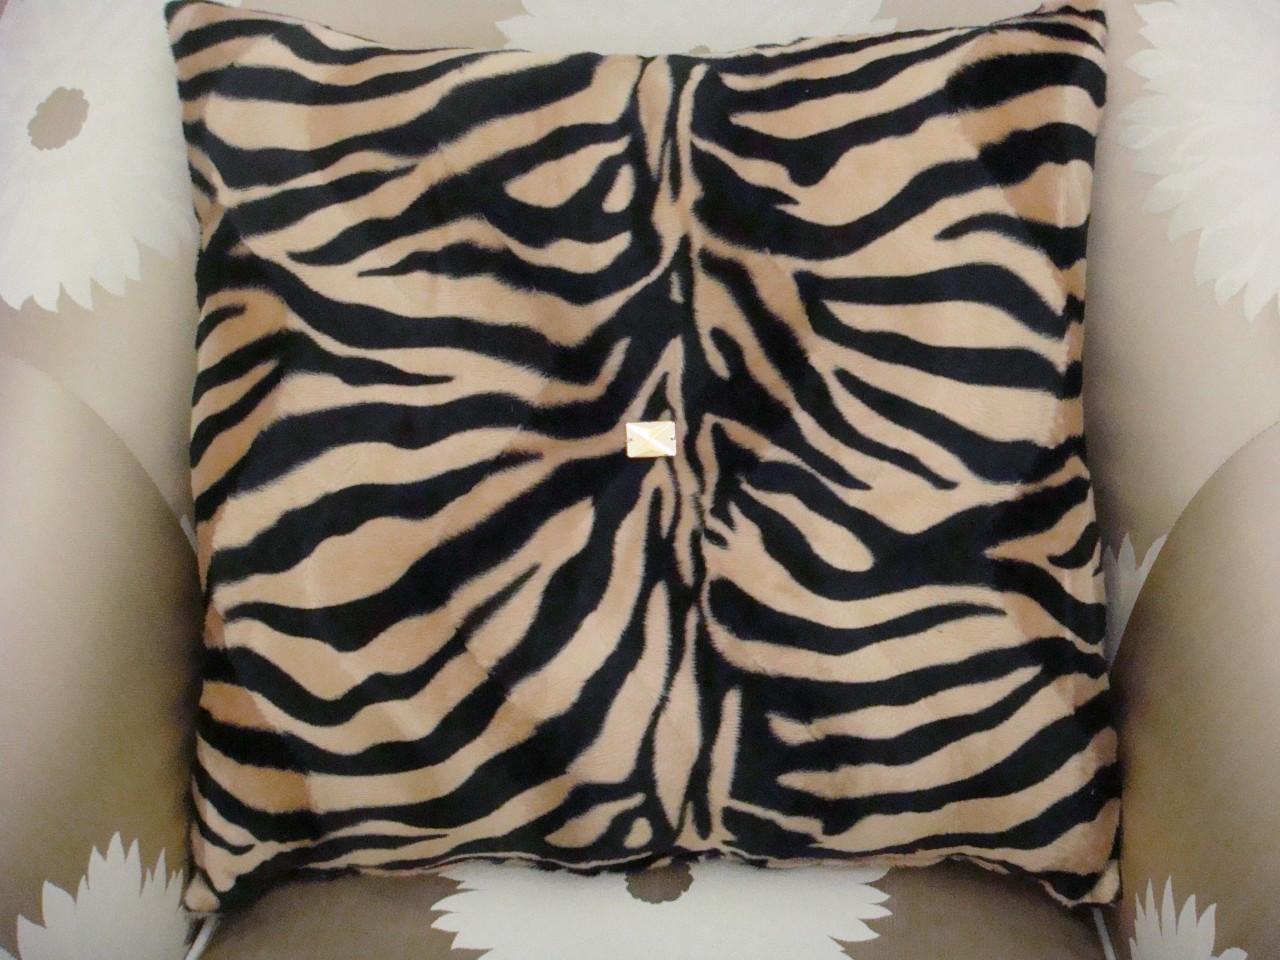 Zebra Print Bling Throw Pillow ....Color Beige/Black